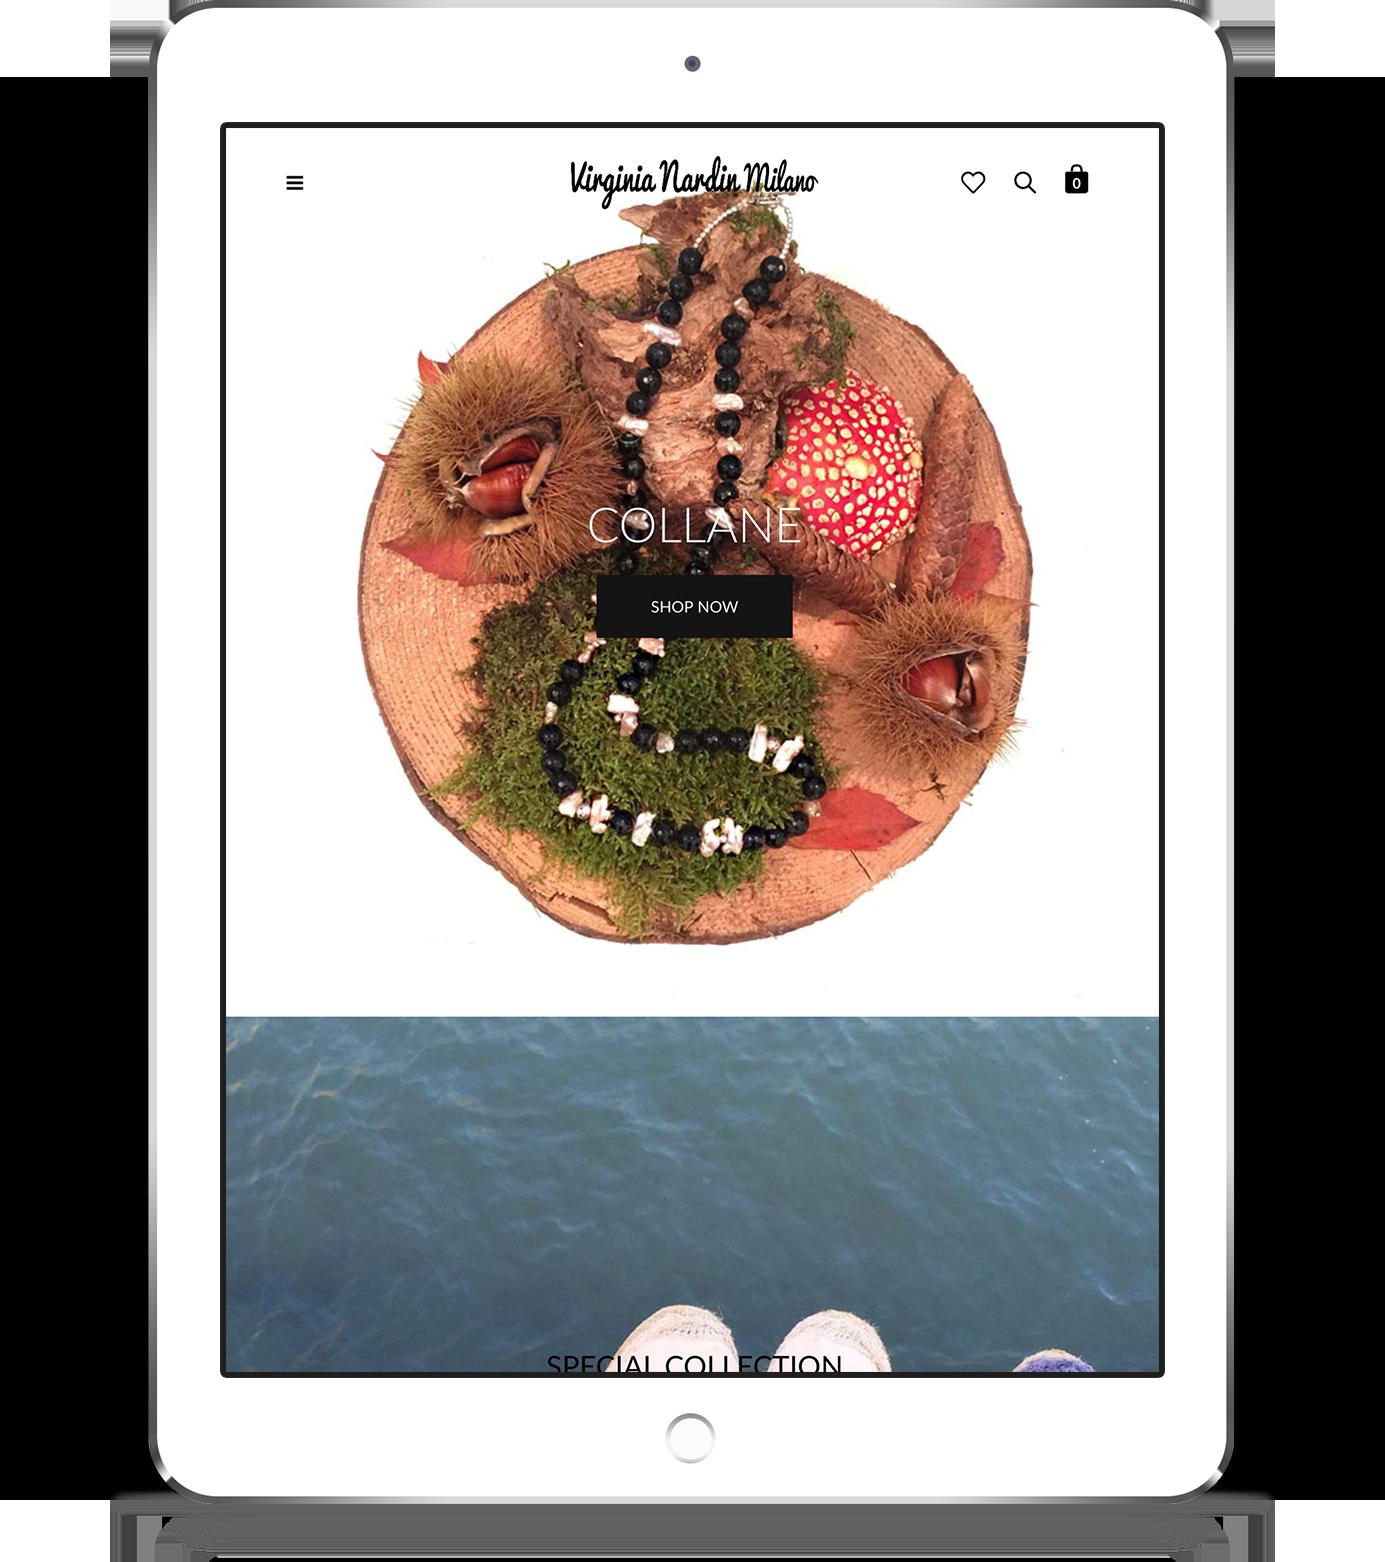 mockup tablet sito web responsivo virginia nardin